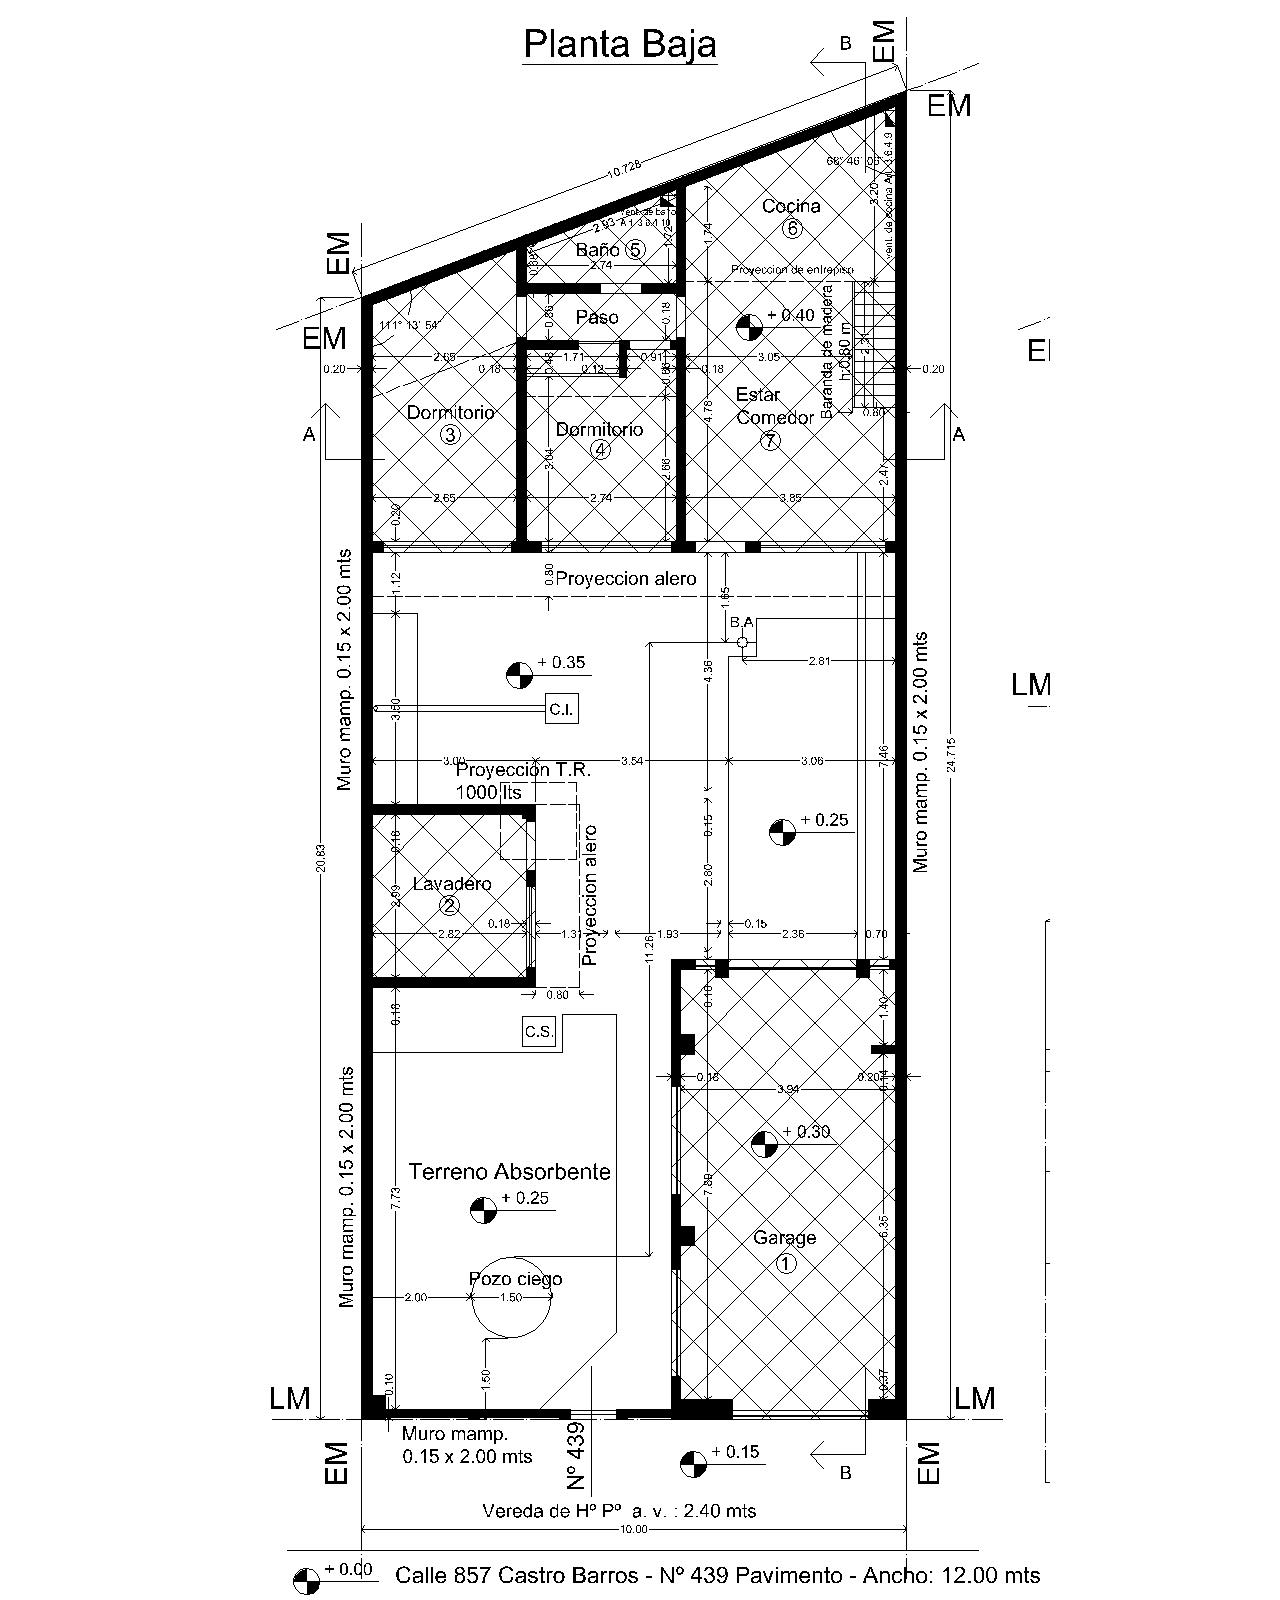 Arquitectura y dise o vivienda unifamiliar - Diseno vivienda unifamiliar ...